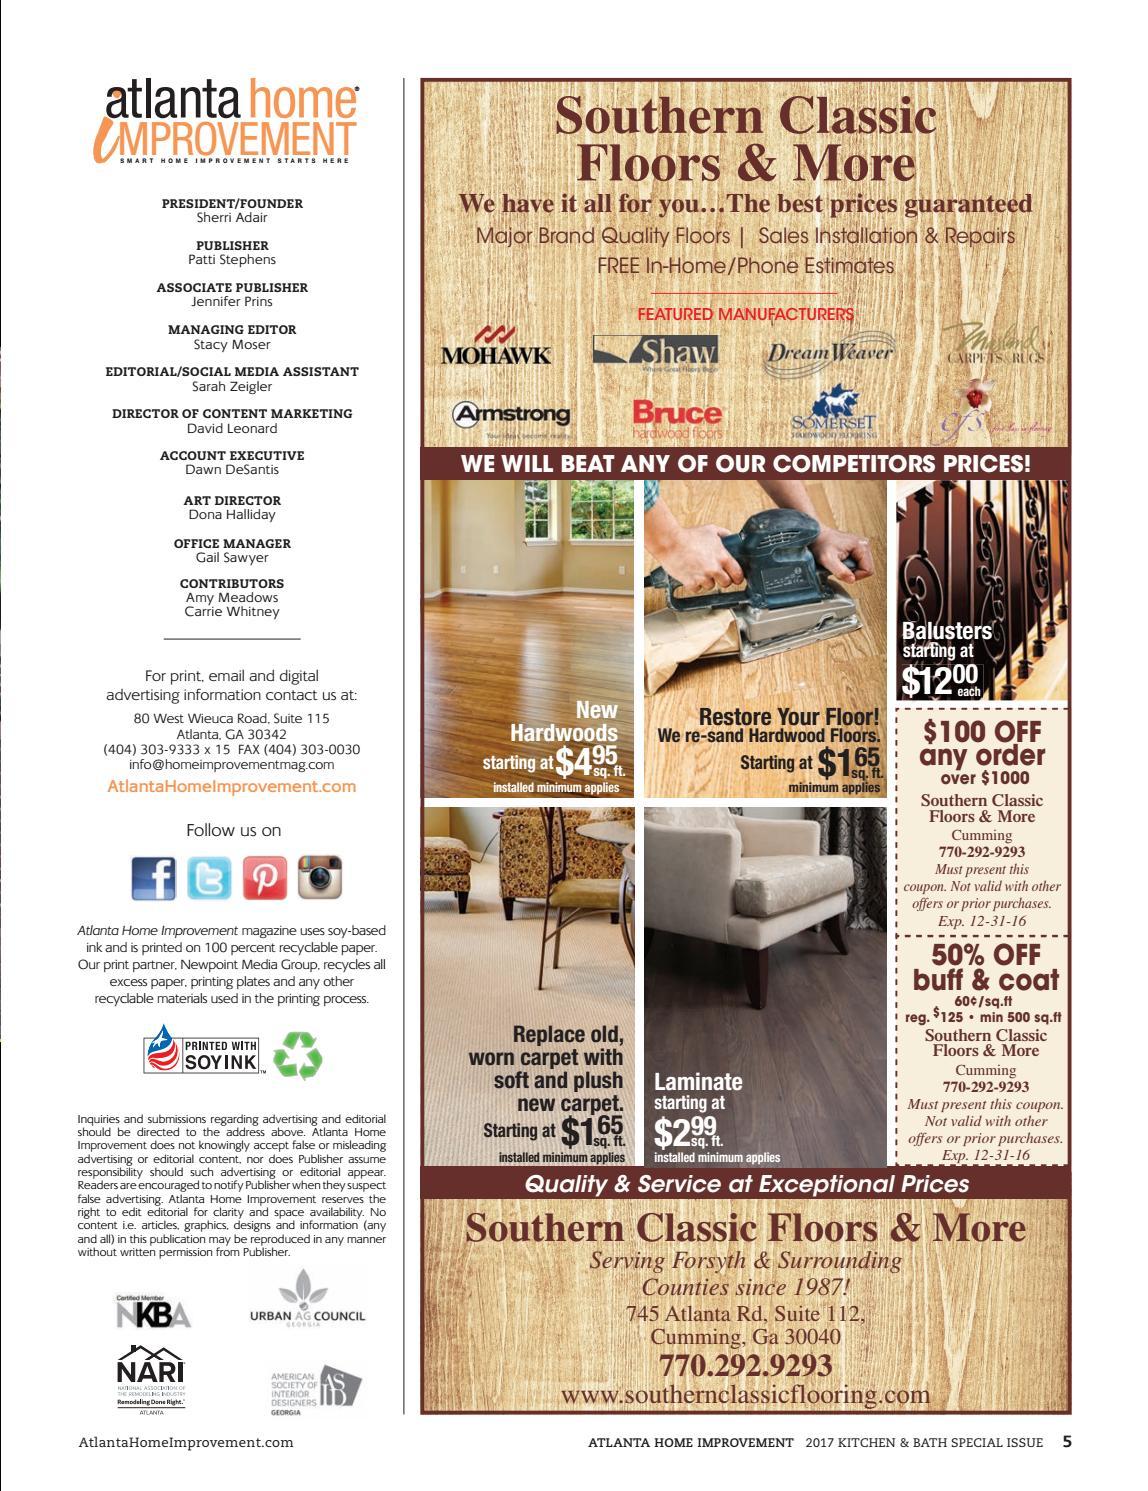 Atlanta Home Improvement 2017 Kitchen Amp Bath Special Issue